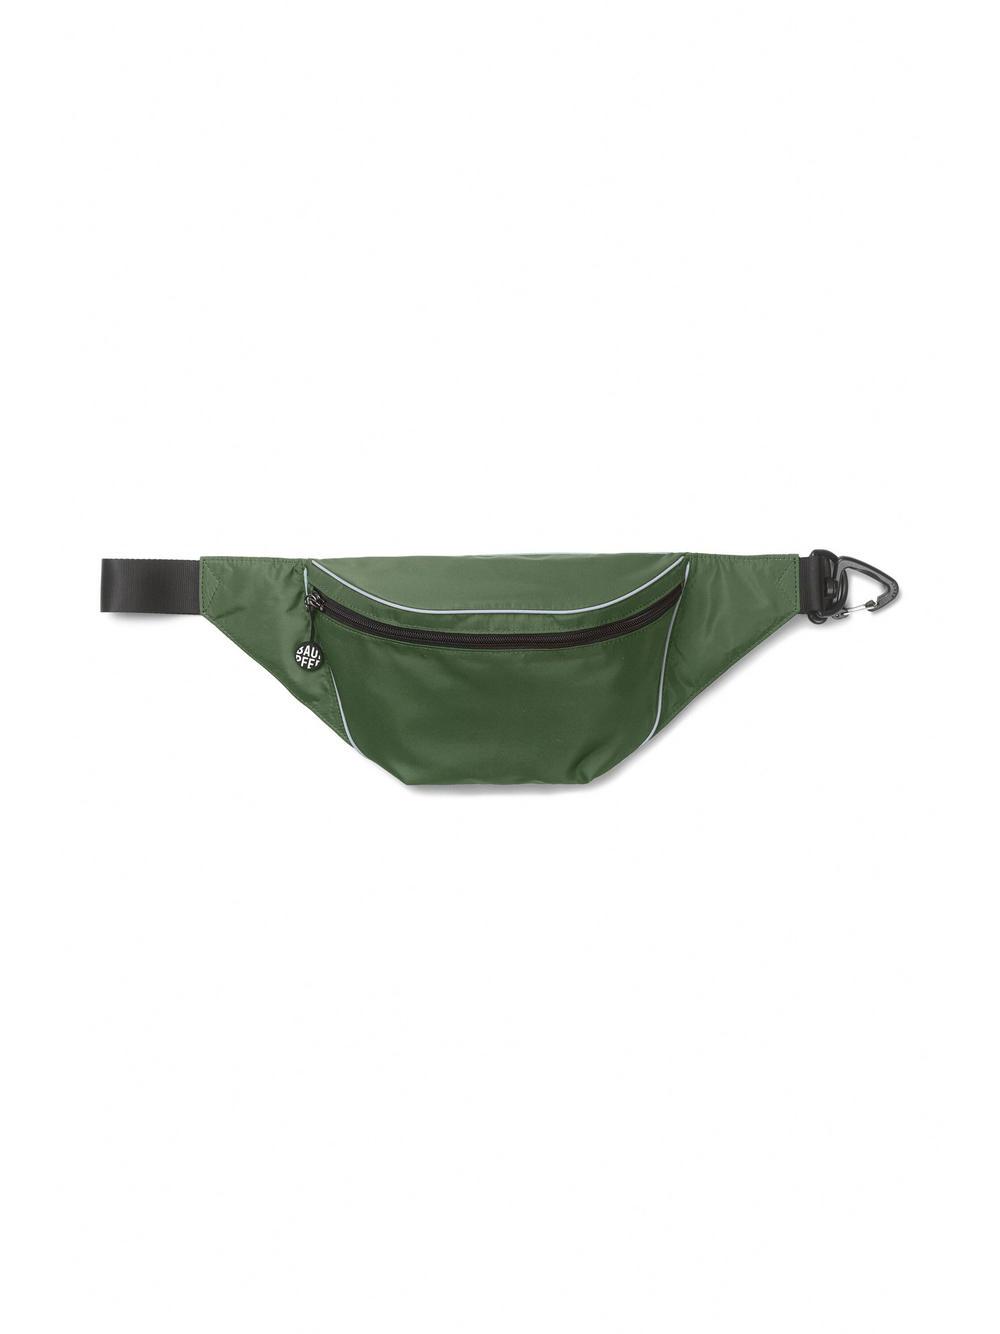 Kiva Belt Bag Item # 21278